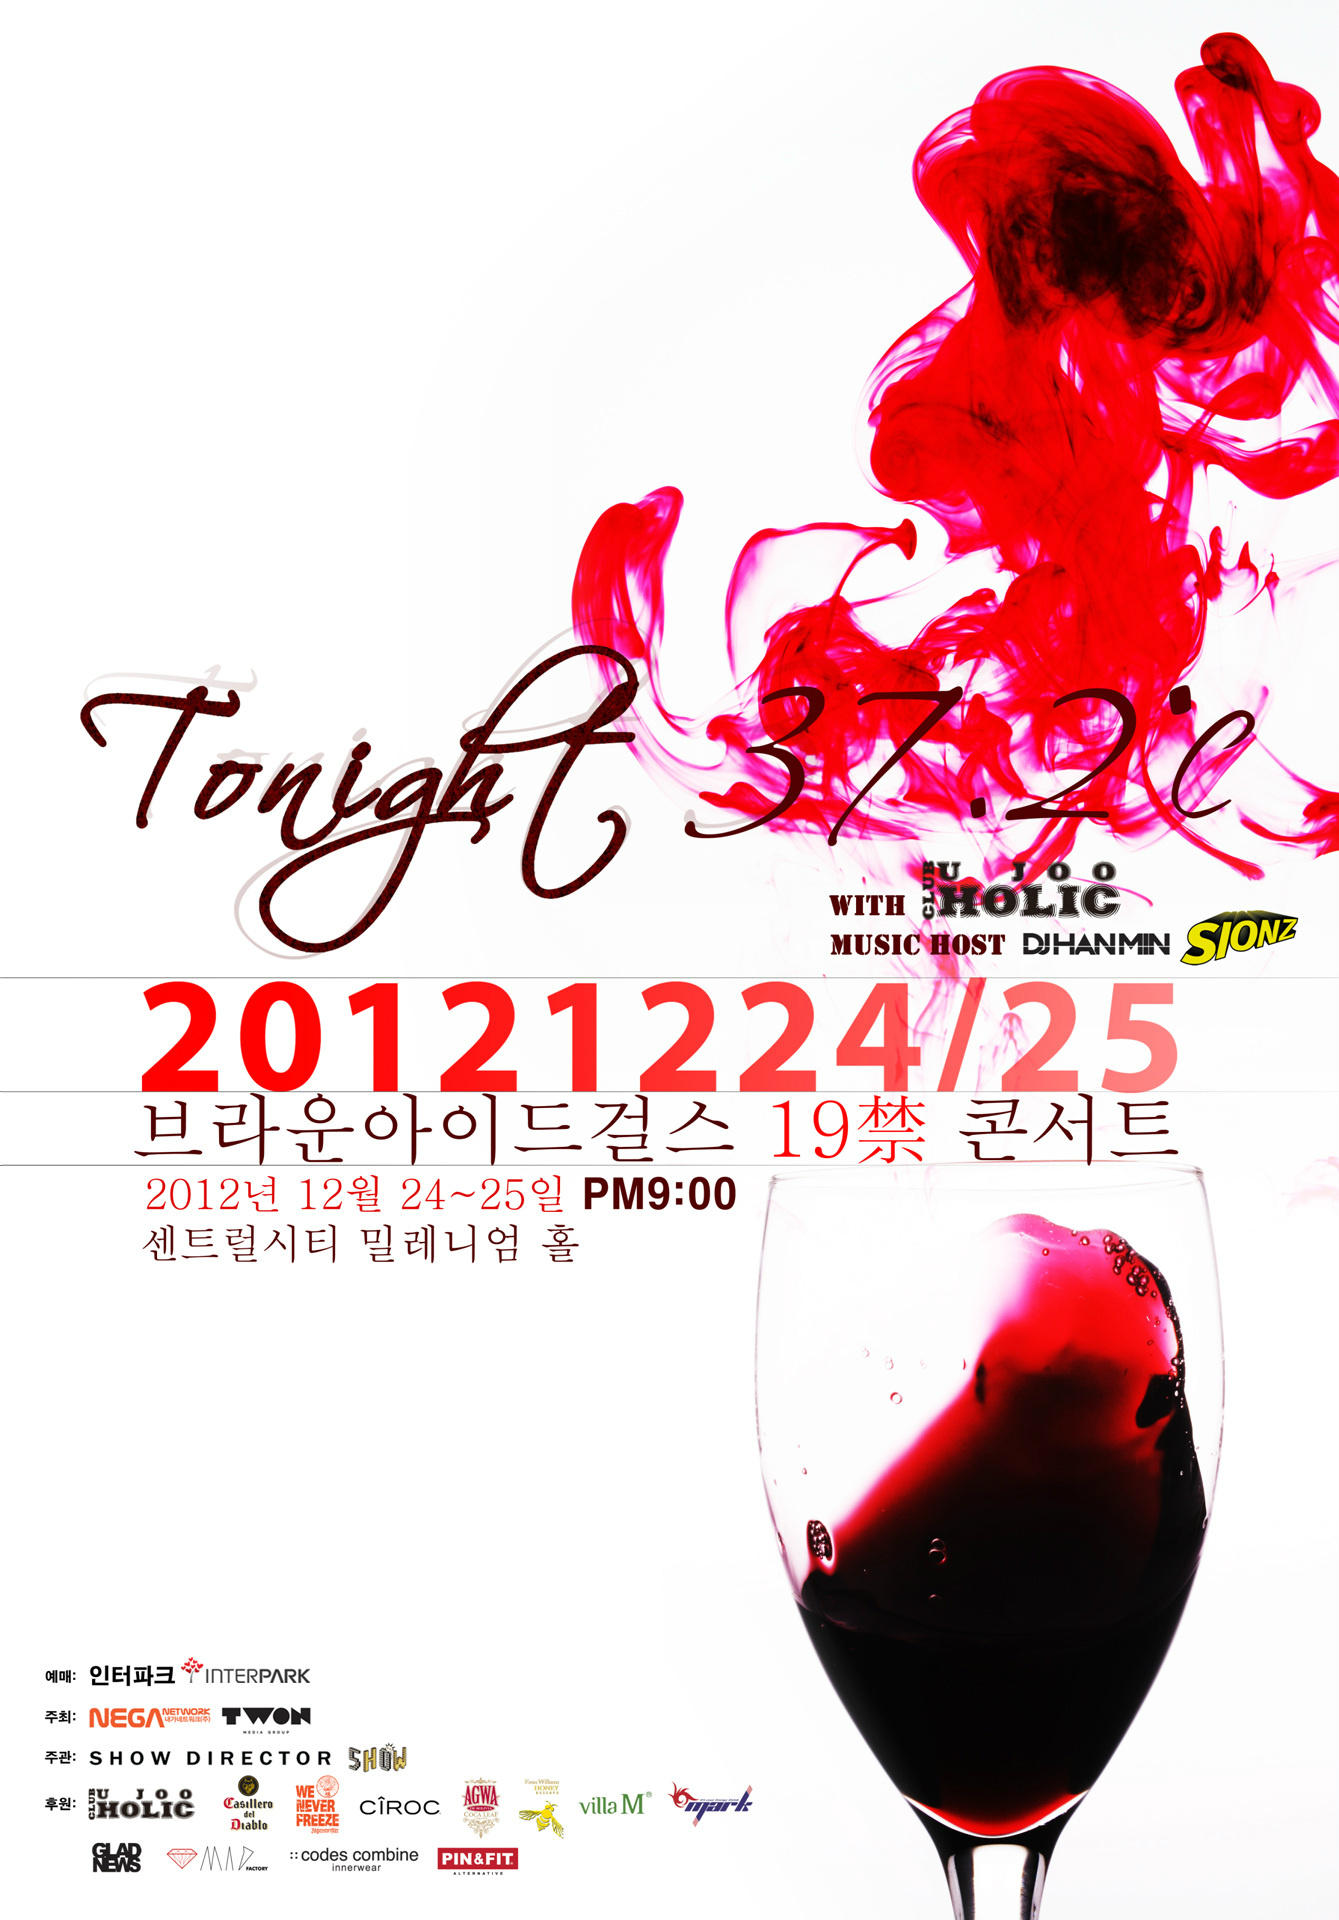 RT @showdirectorceo: New Image! Tonight 37.2! http://t.co/YcmWjbOc